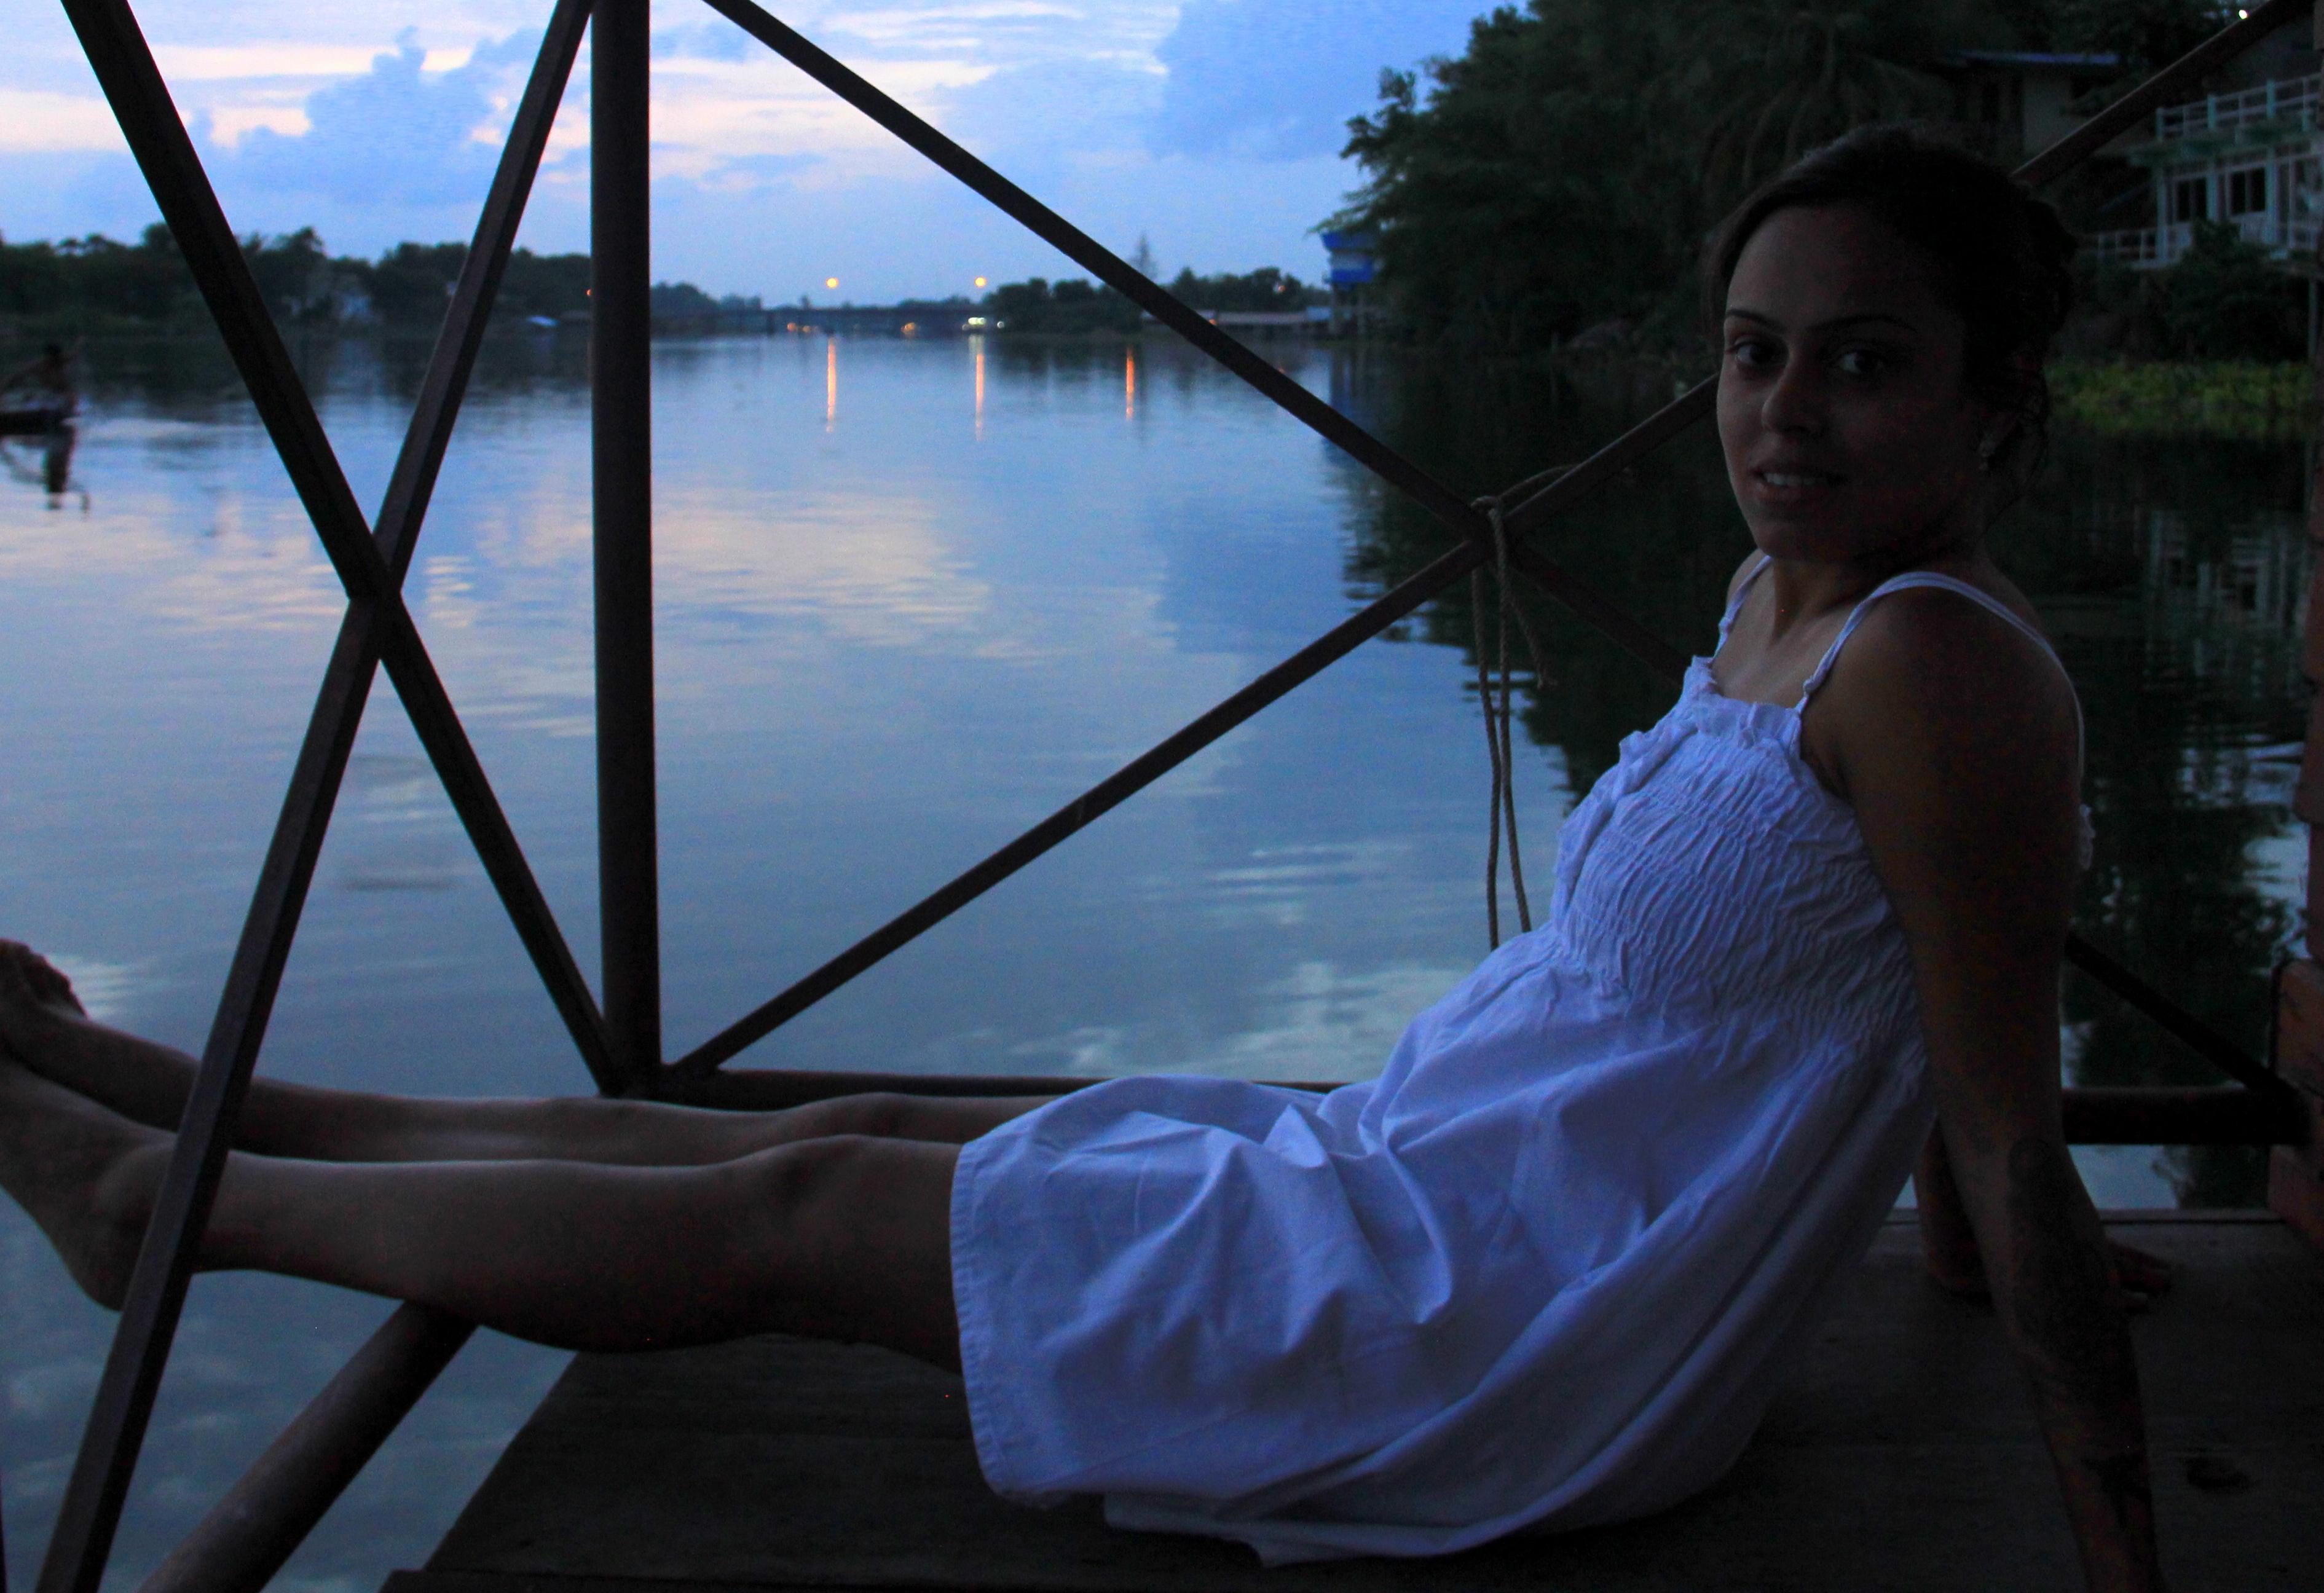 #Thailand #Kanchanaburi #maverickbird #travelblog